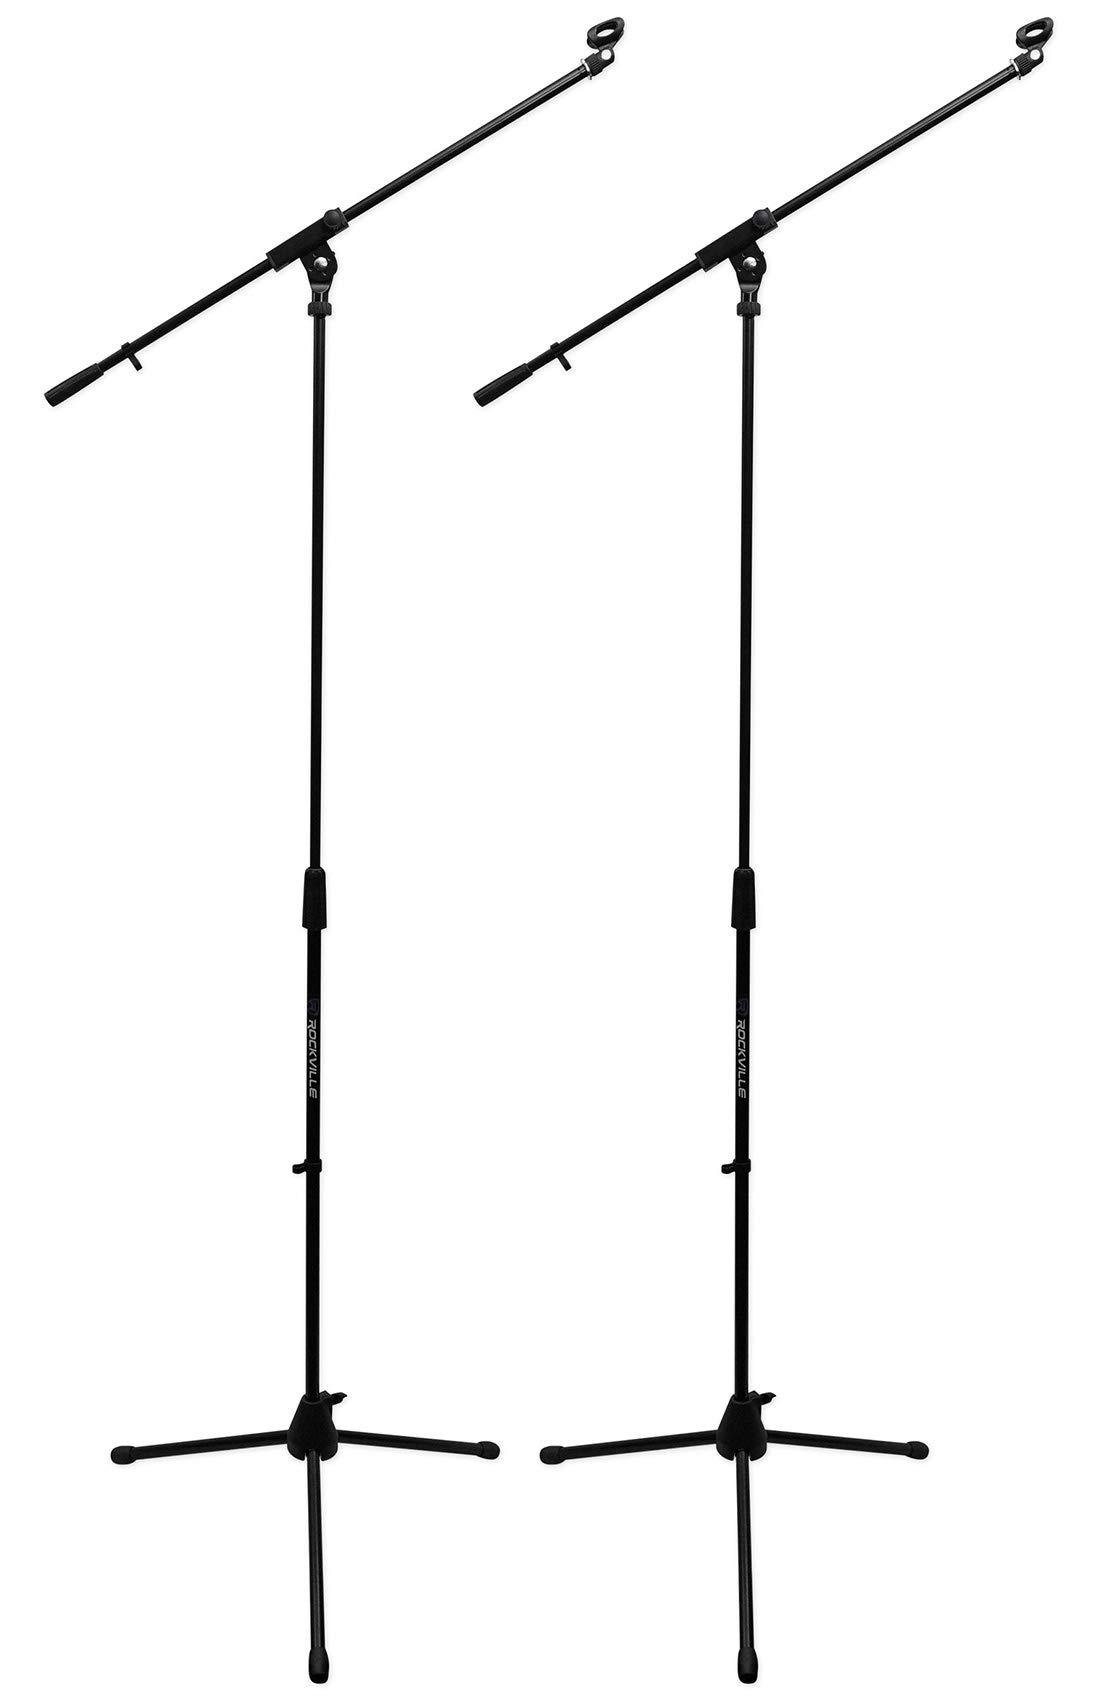 (2) Rockville RVMIC1 Dual Boom Microphone Stands w/ Tripod Base